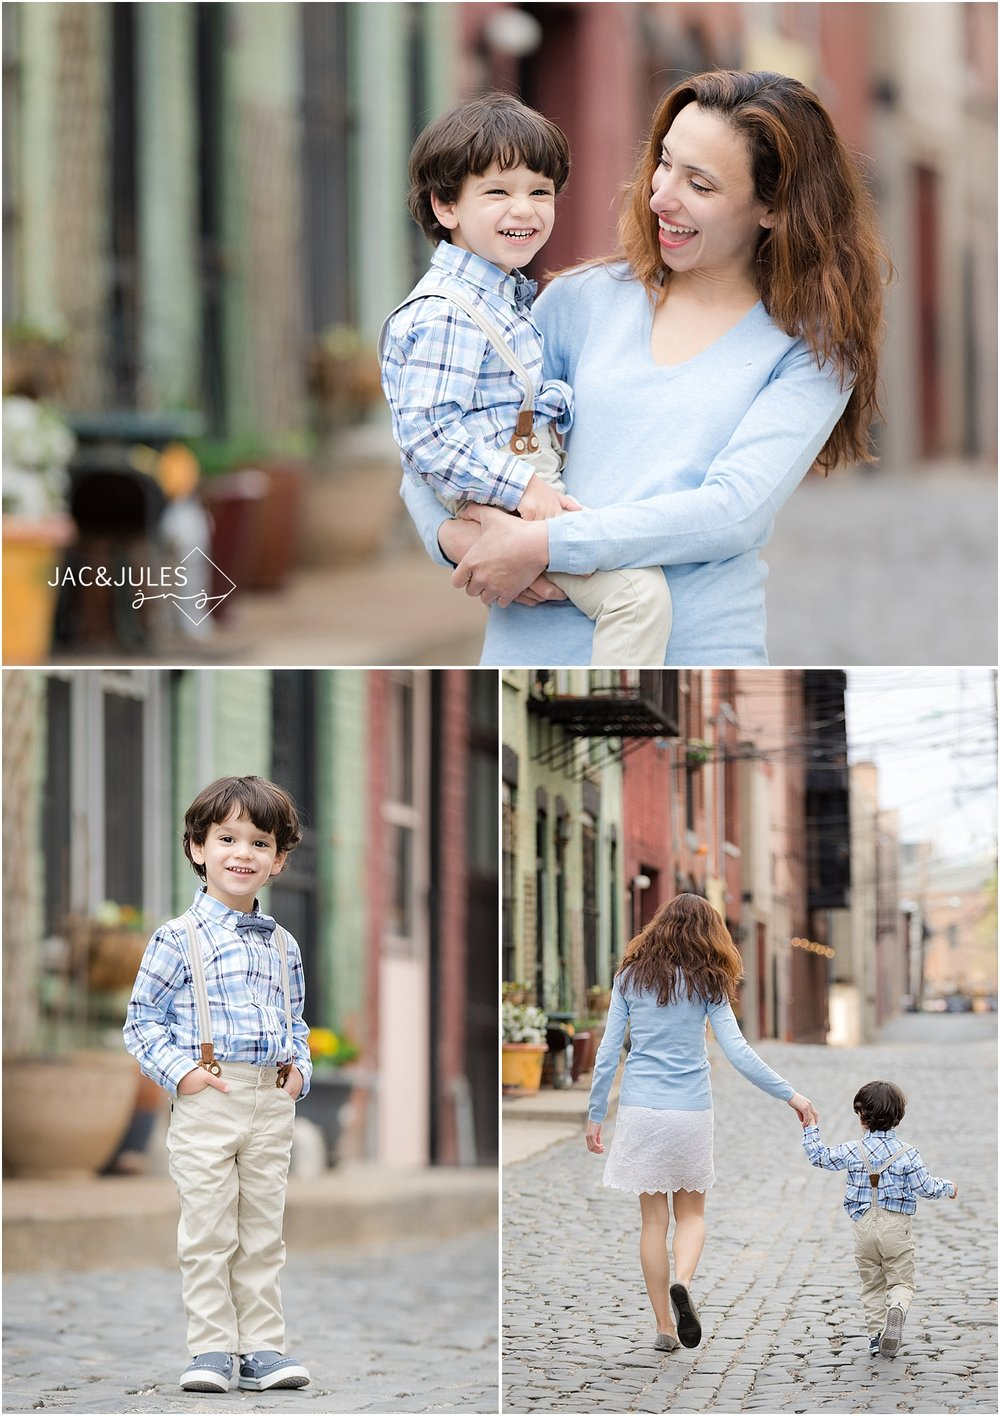 jacnjules photographs mom and son in Hoboken NJ using natural light